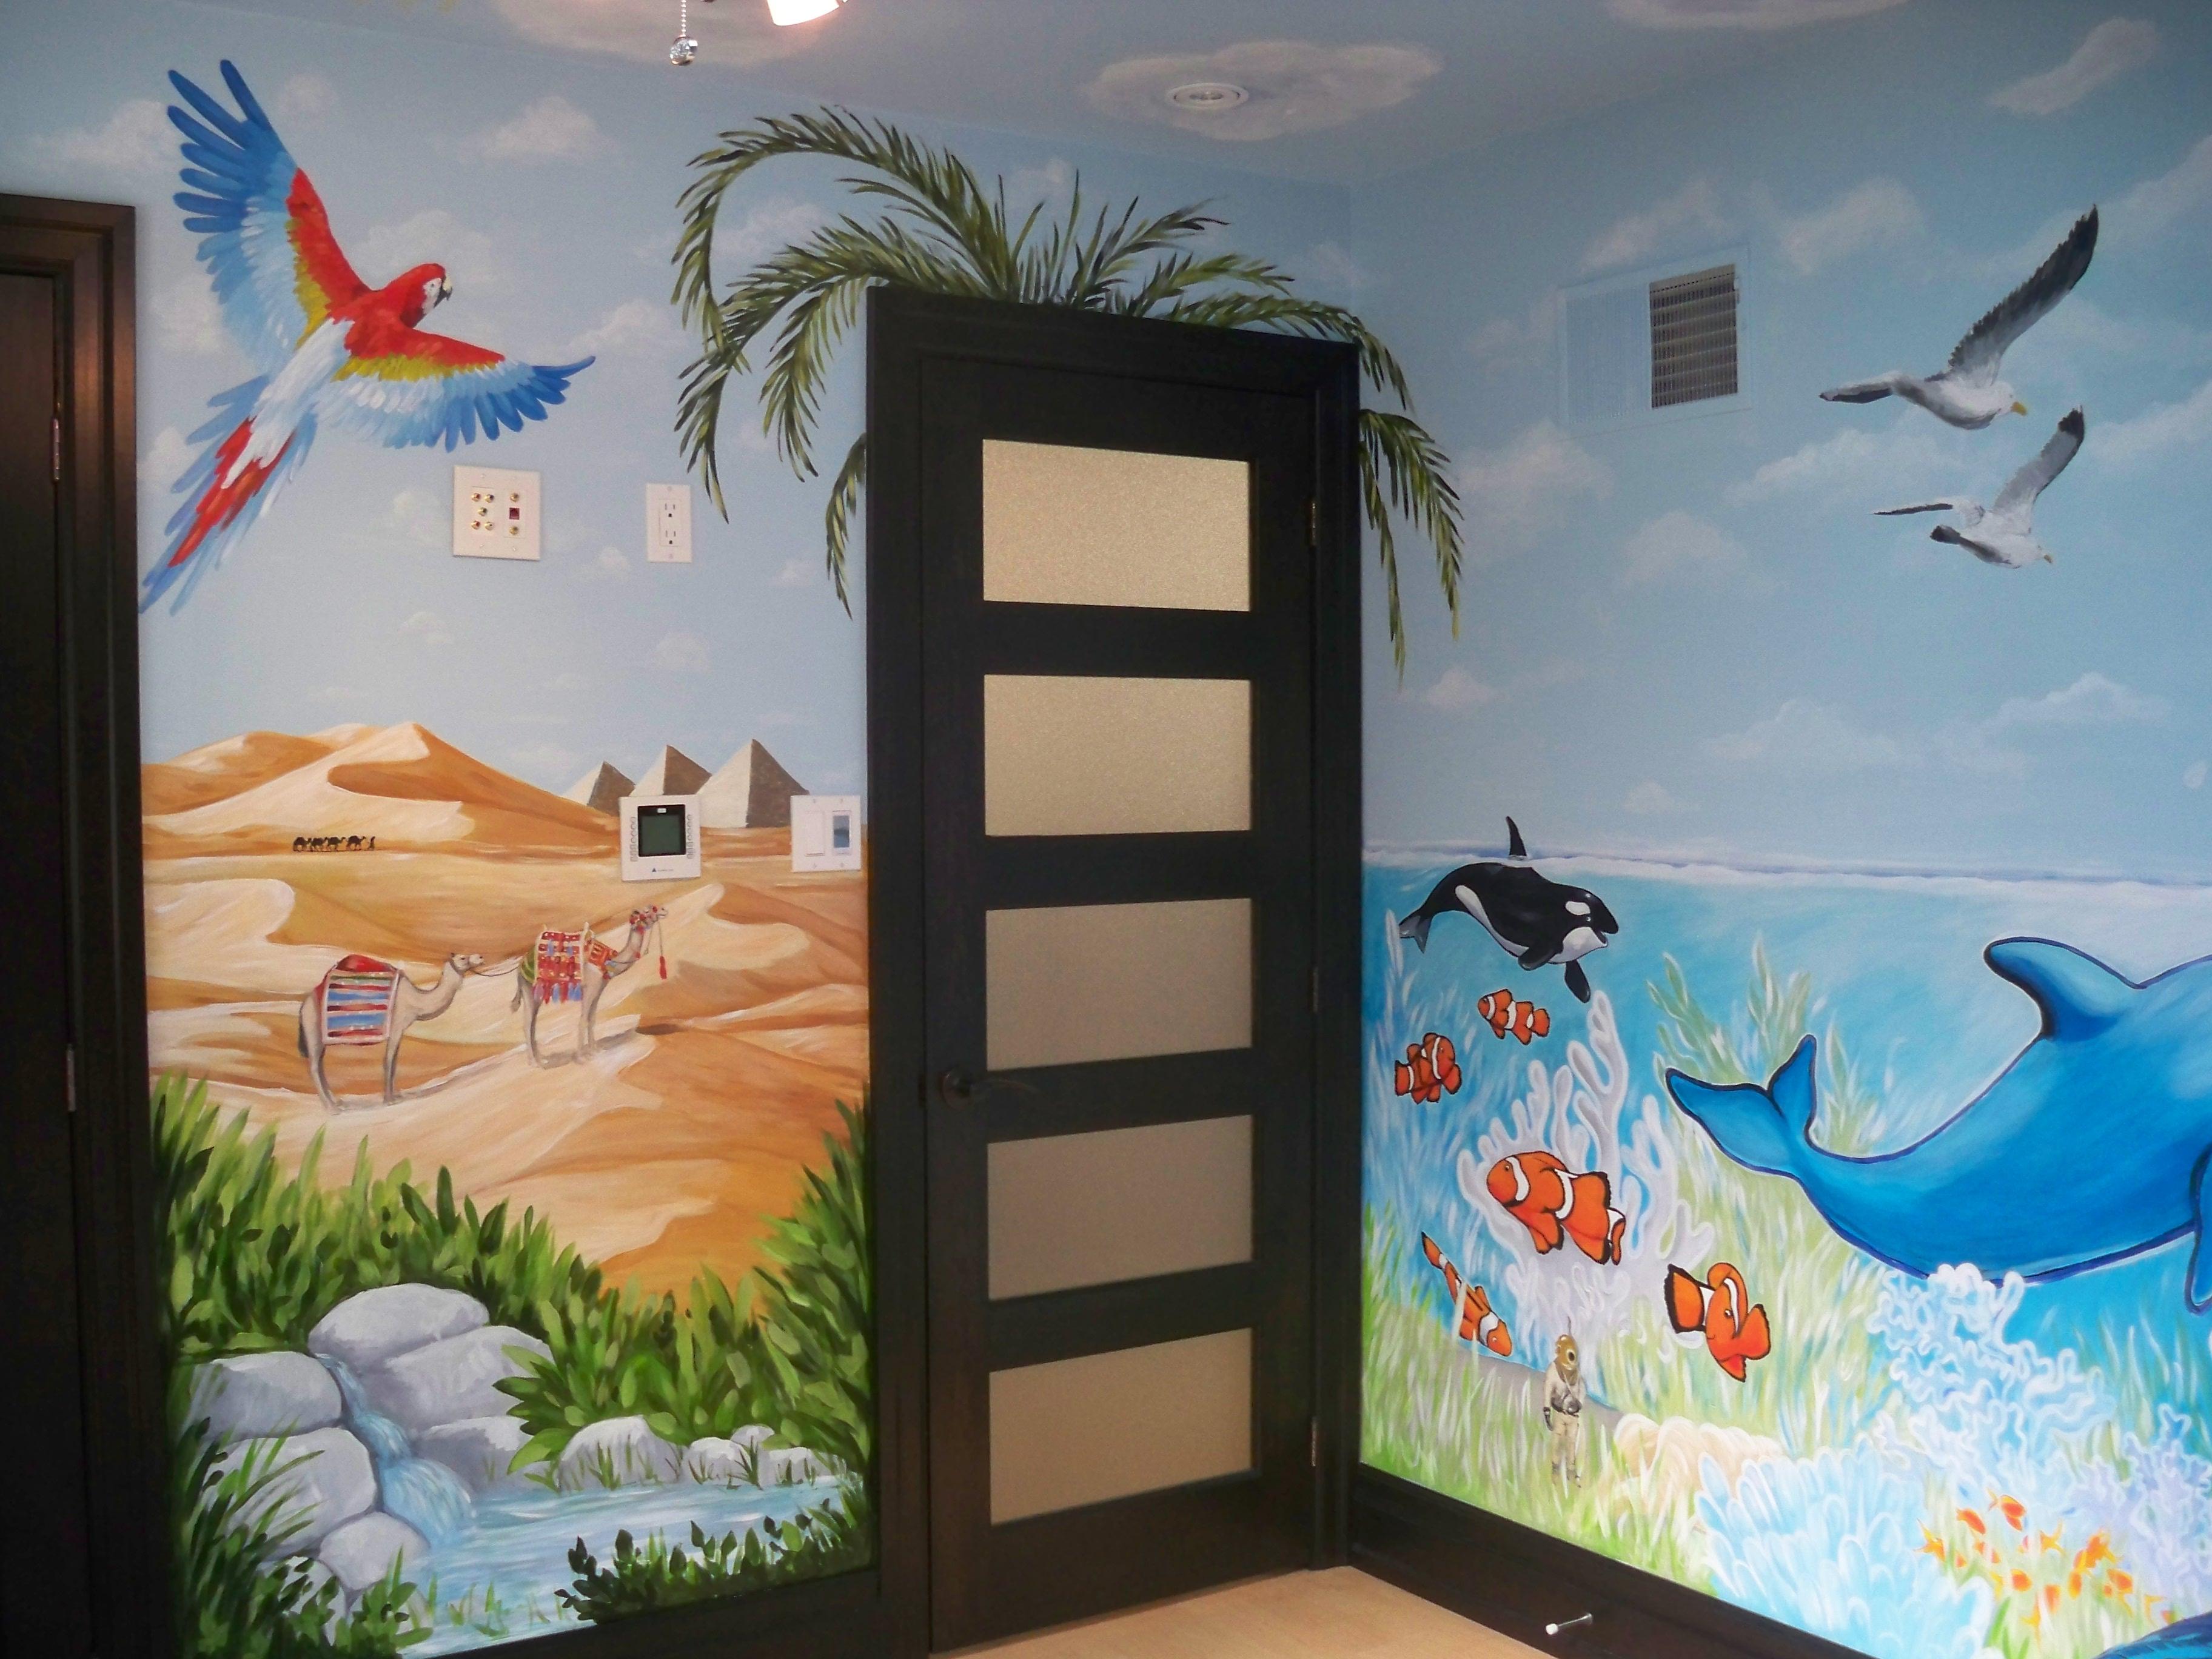 Murals By Marg Safari room mural painting 2.JPG